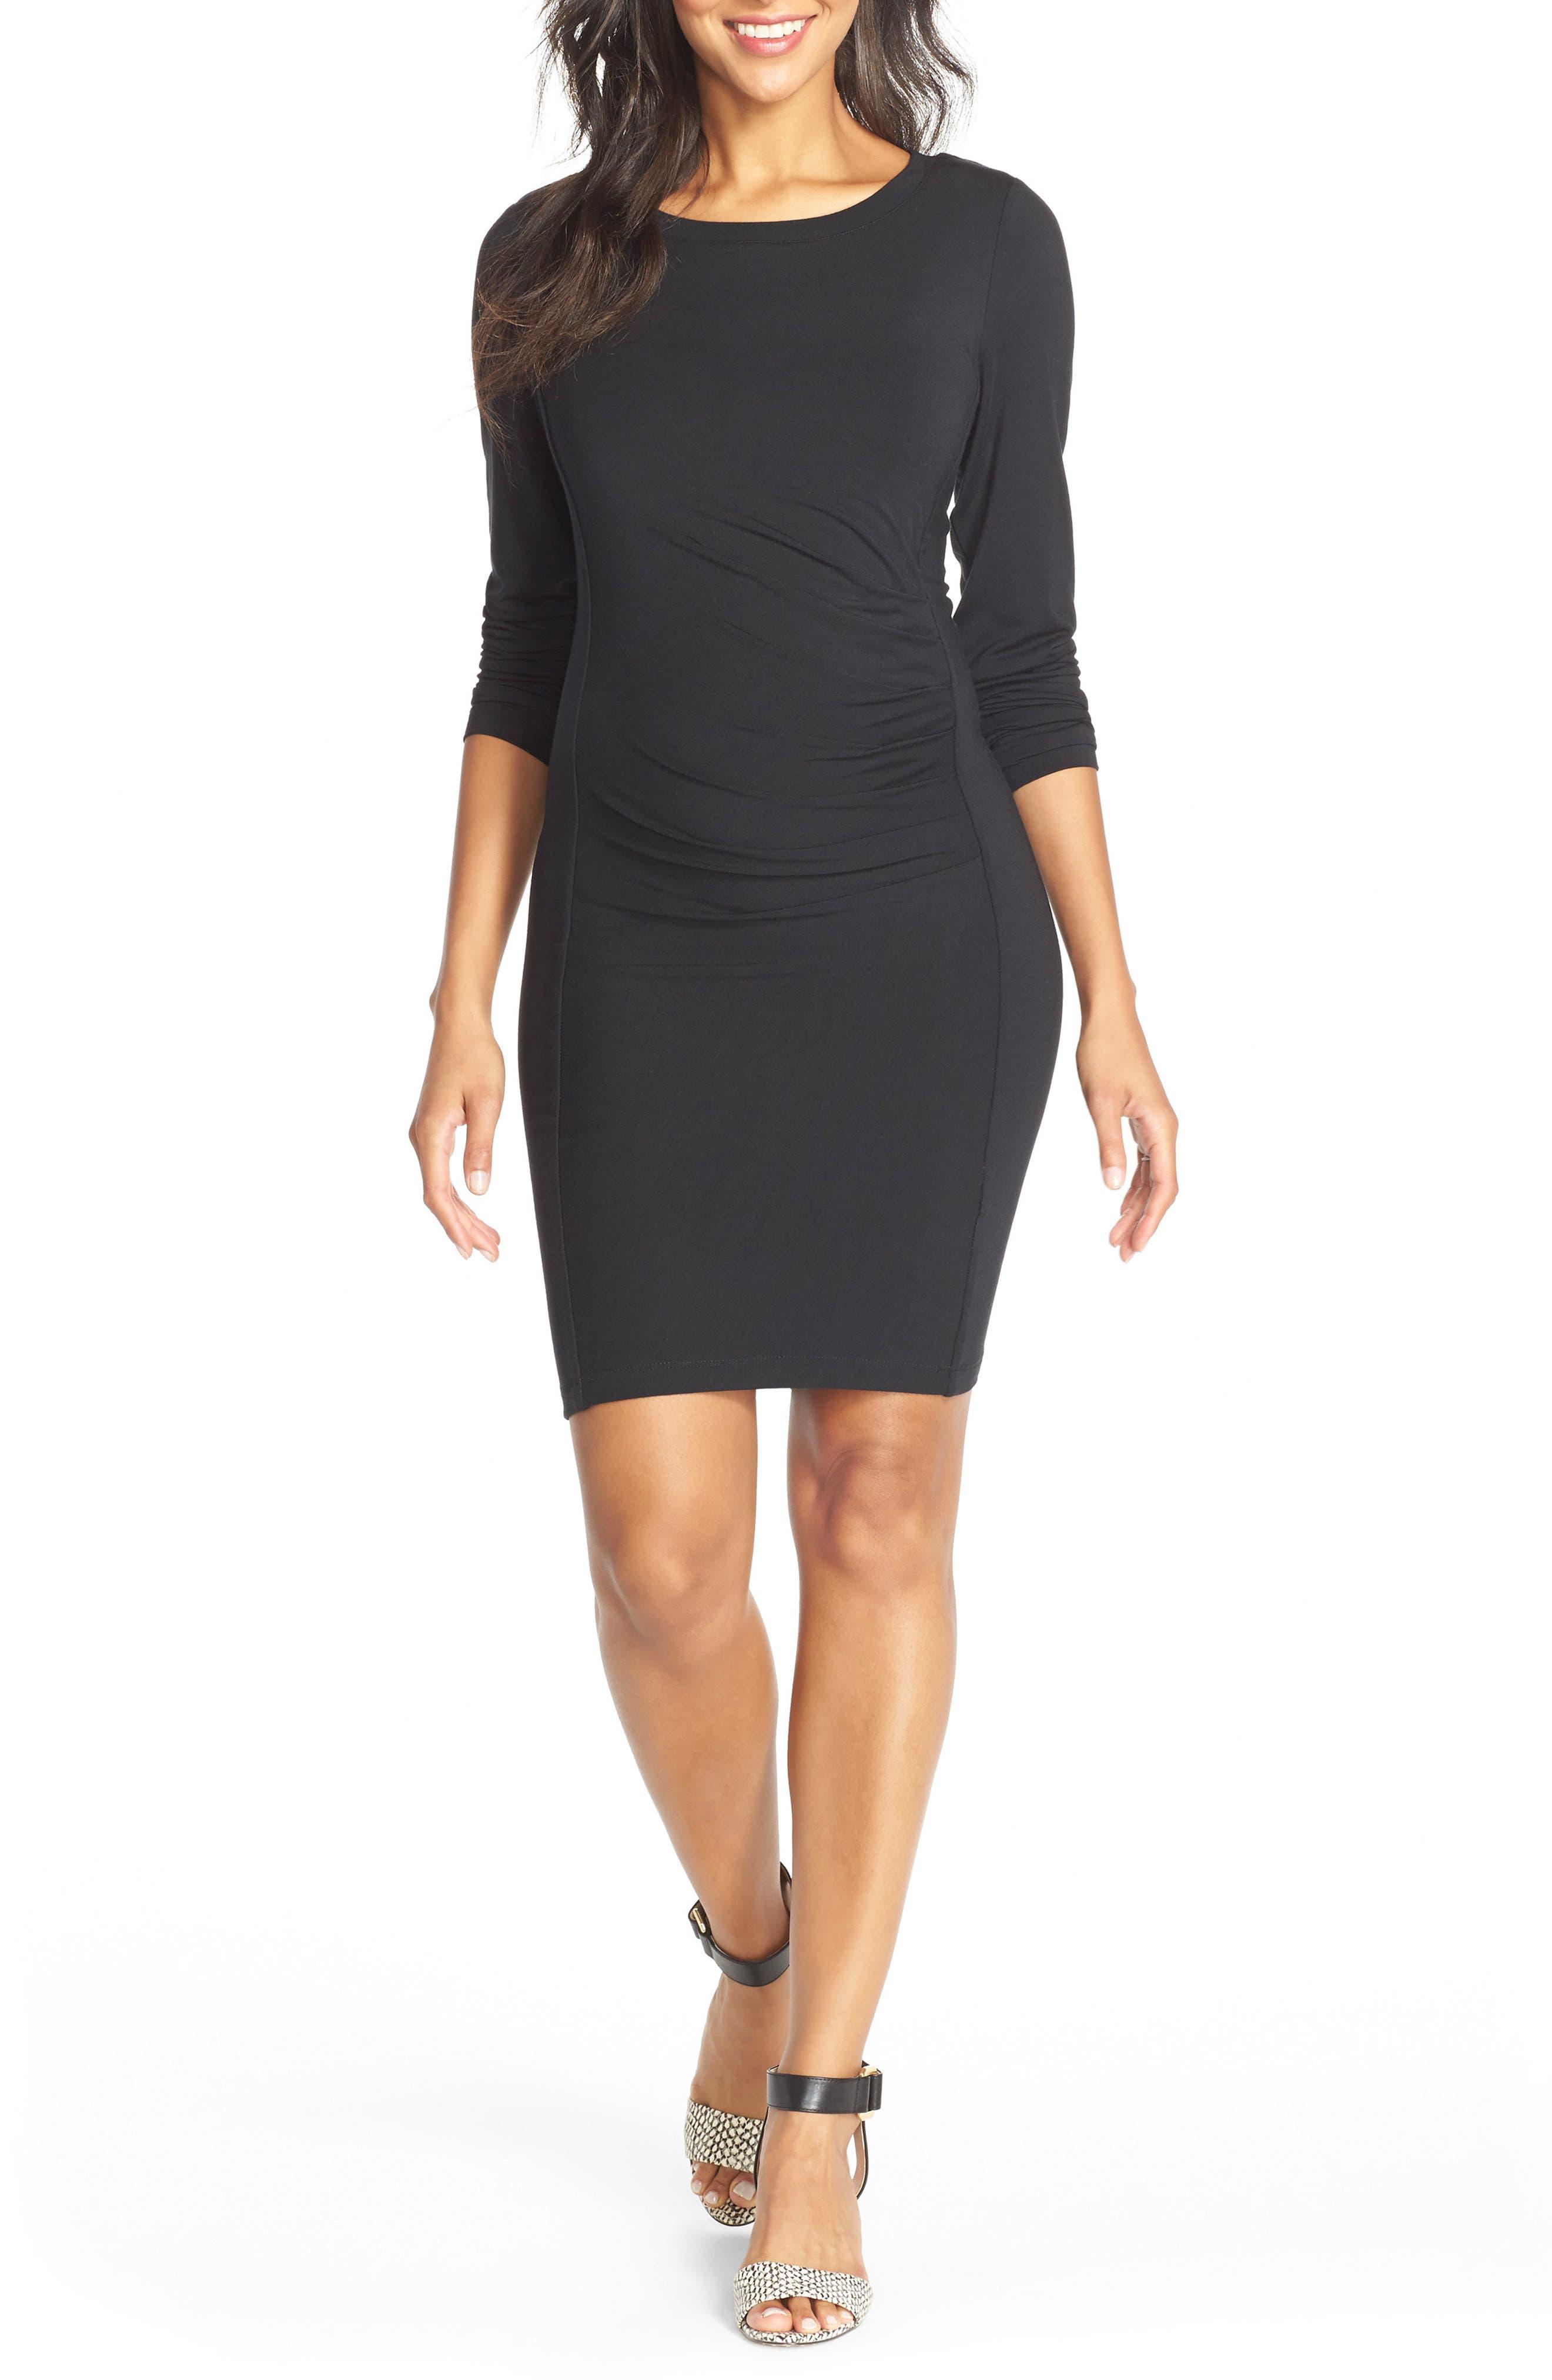 TART MATERNITY, 'Whitney' Maternity Dress, Main thumbnail 1, color, BLACK